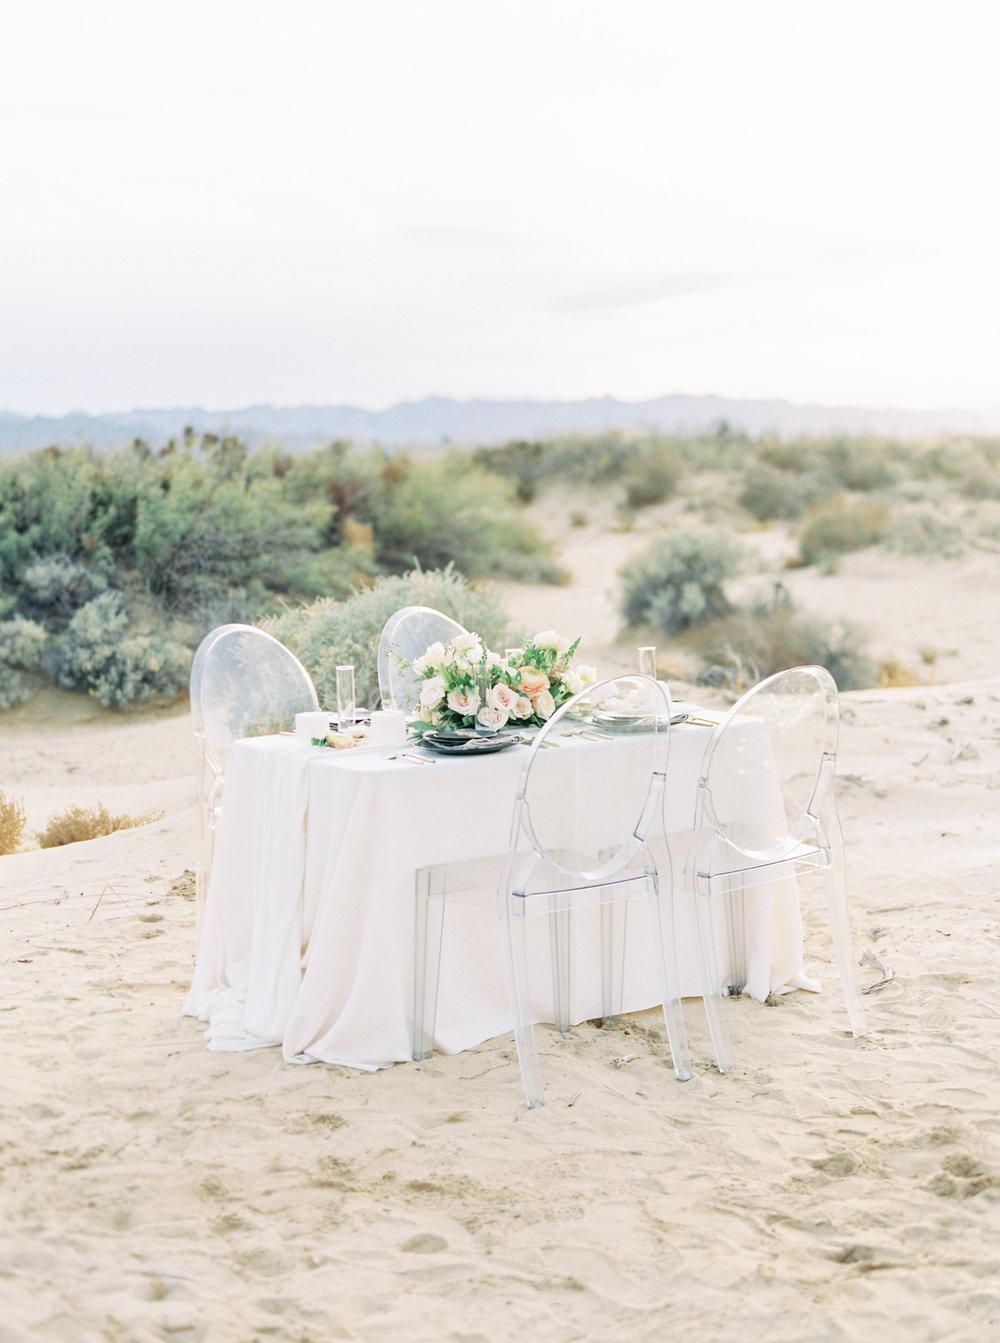 Savan Photography | Pirouette Paper Calligraphy + Design | Joshua Tree Palm Desert Wedding Inspiration